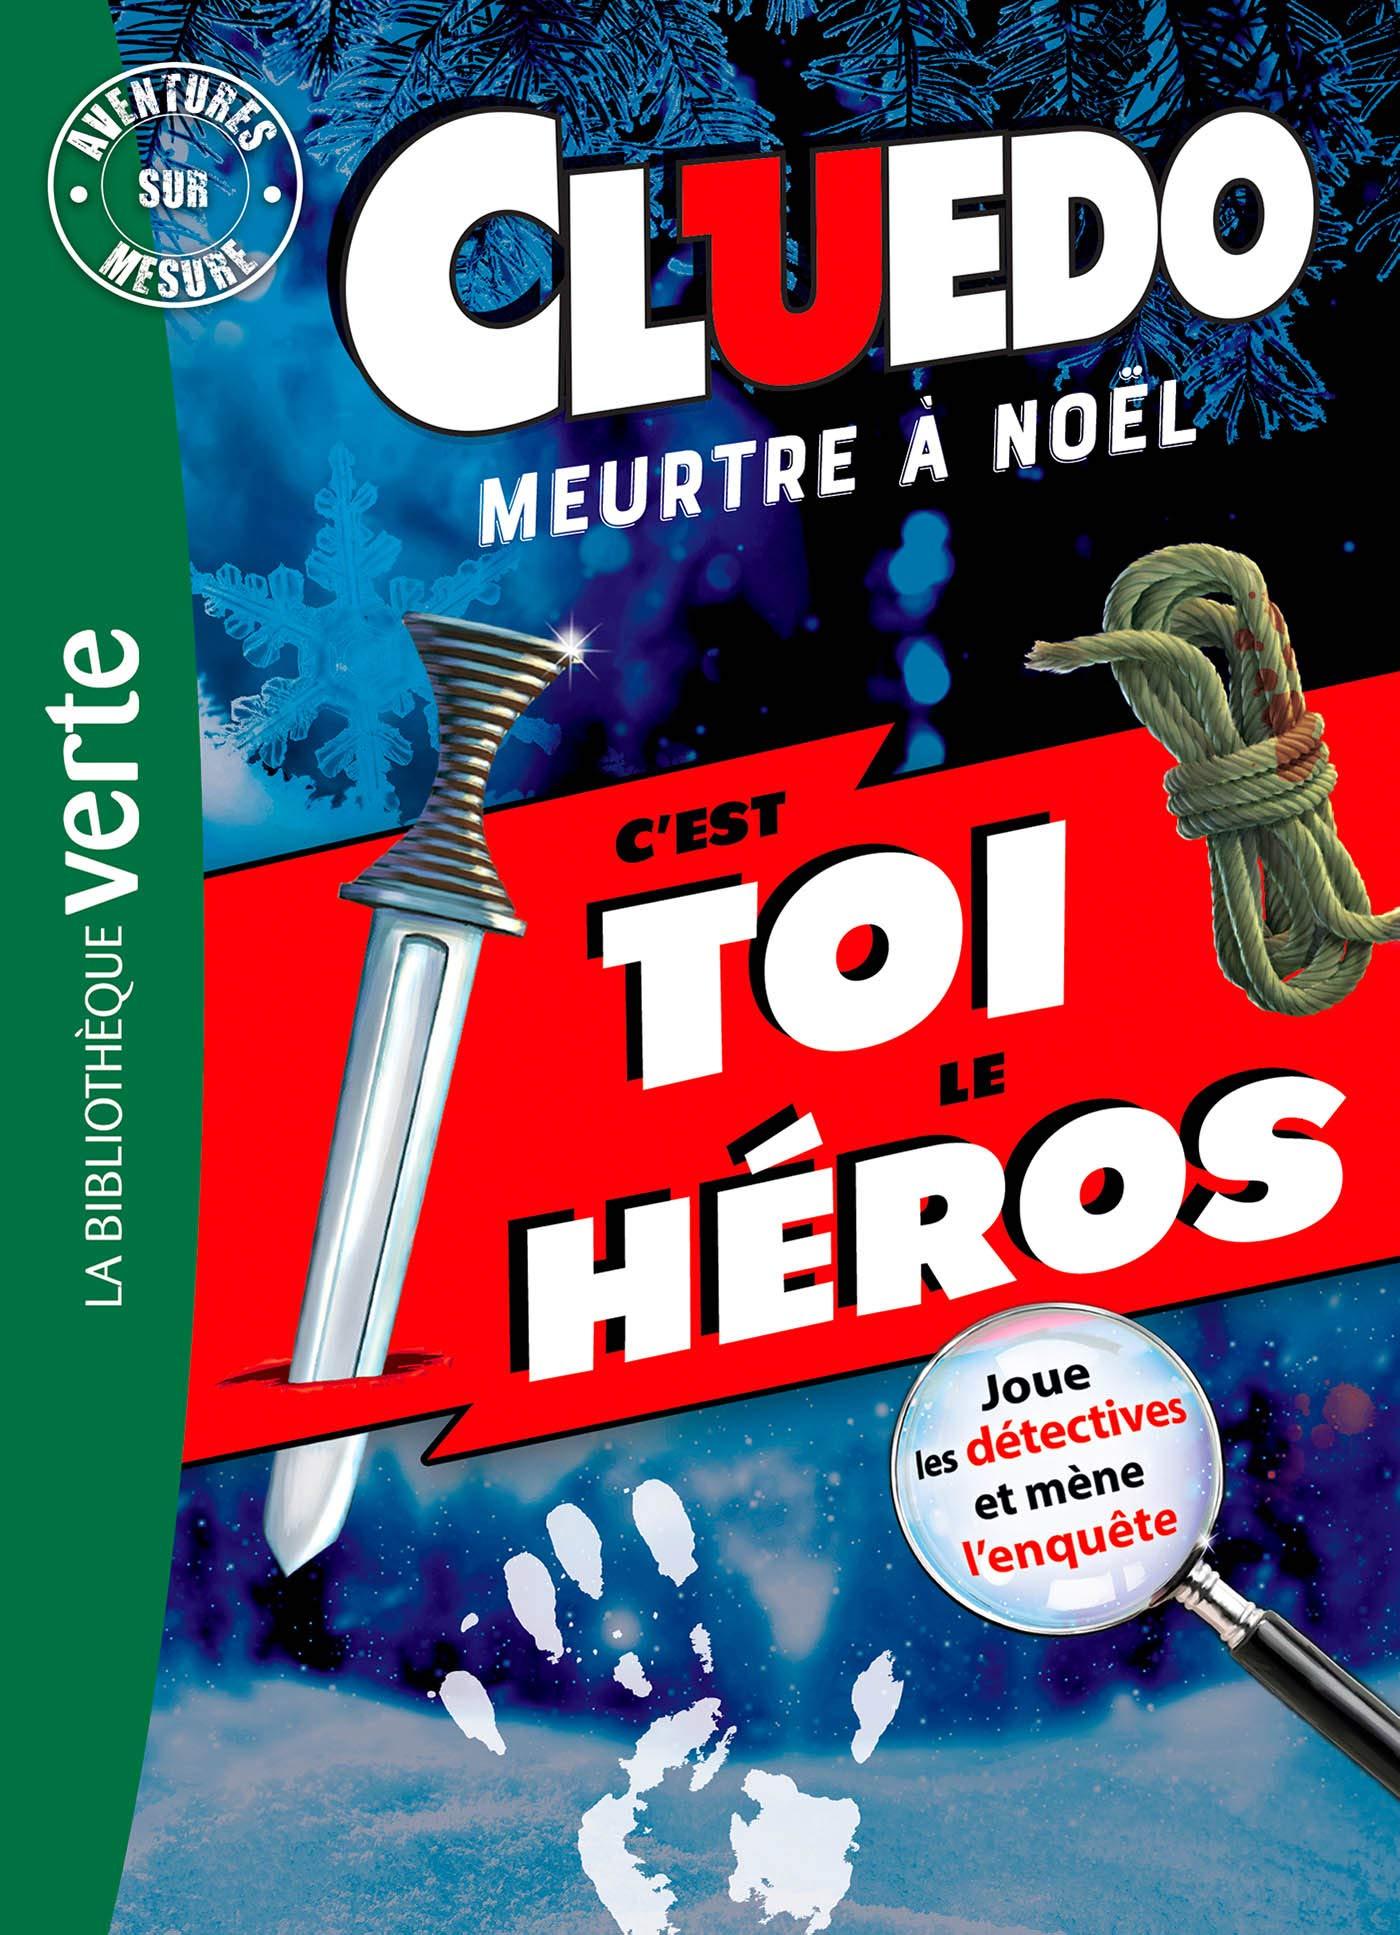 Cluedo - Aventures sur mesure XXL - Meurtre à Noël: 0 Bibliothèque Verte Plus: Amazon.es: Hasbro: Libros en idiomas extranjeros